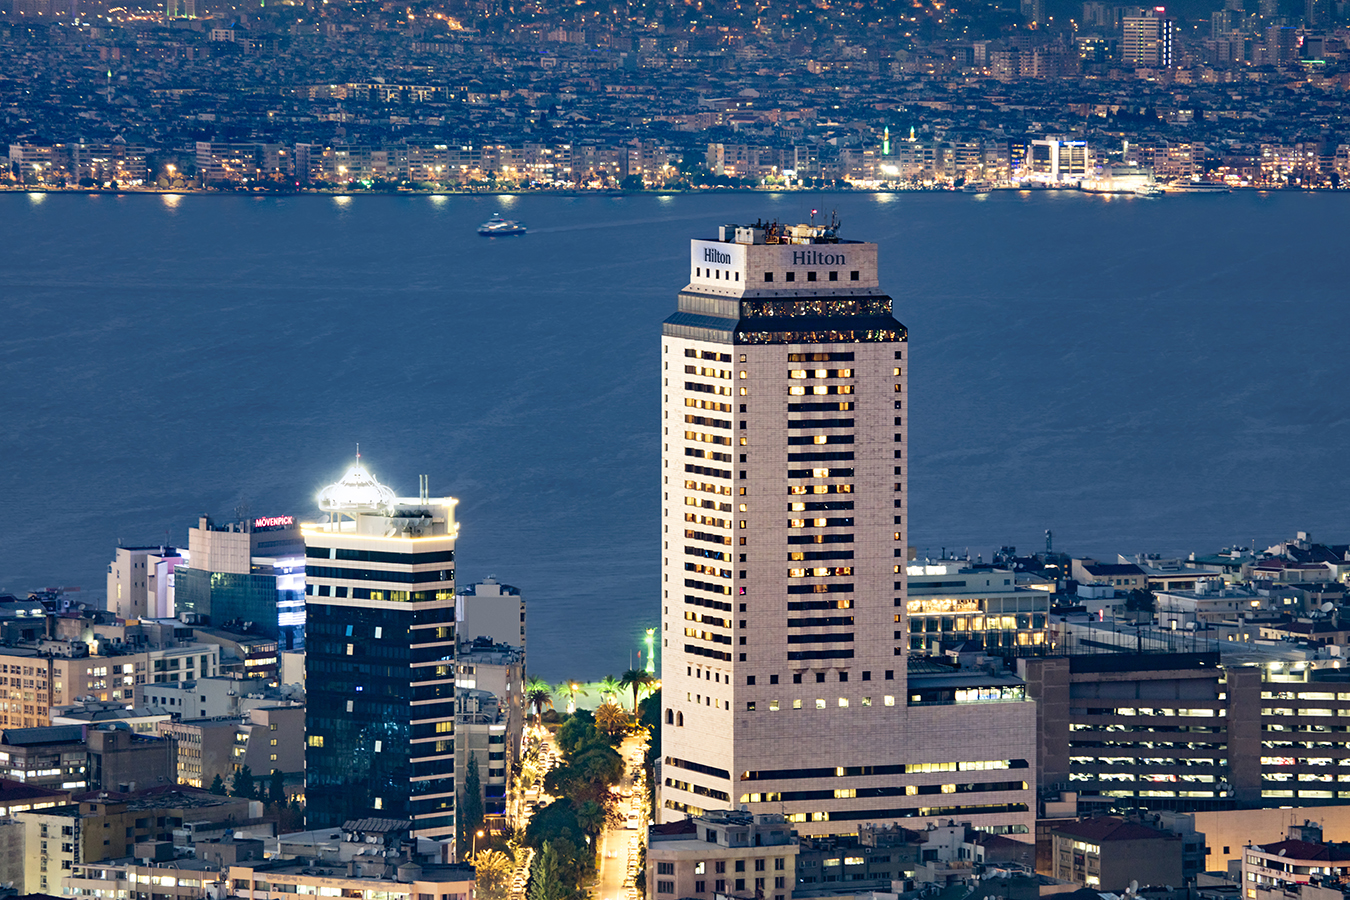 İzmir Hilton